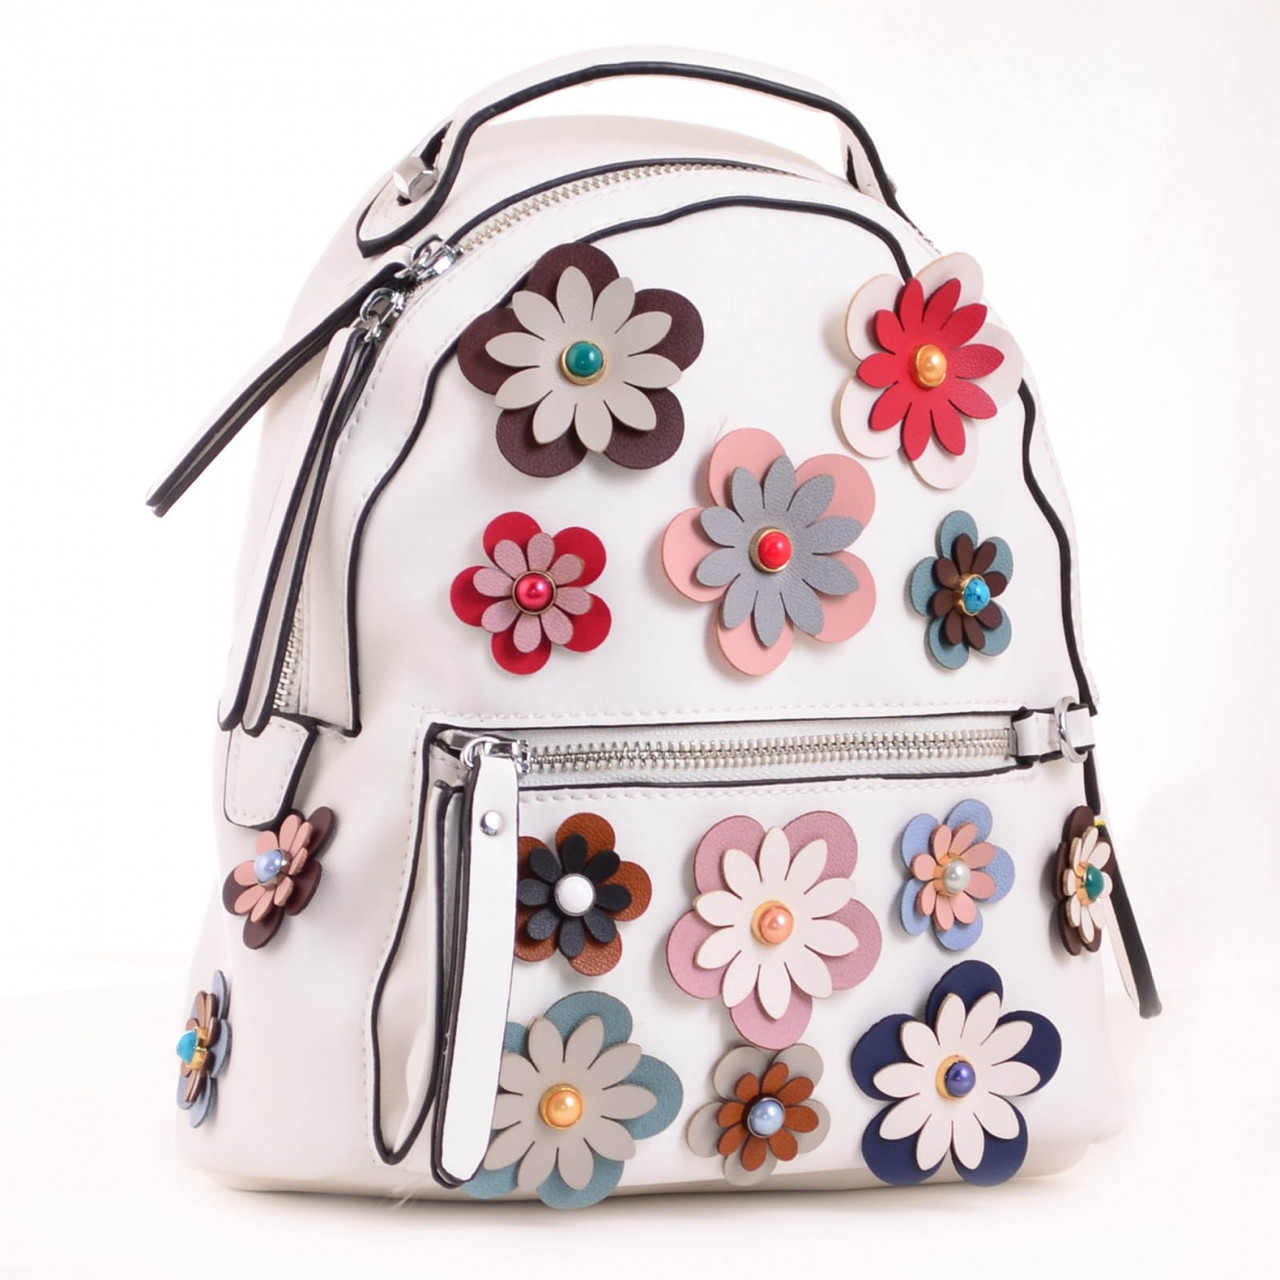 Сумка - рюкзак, белый